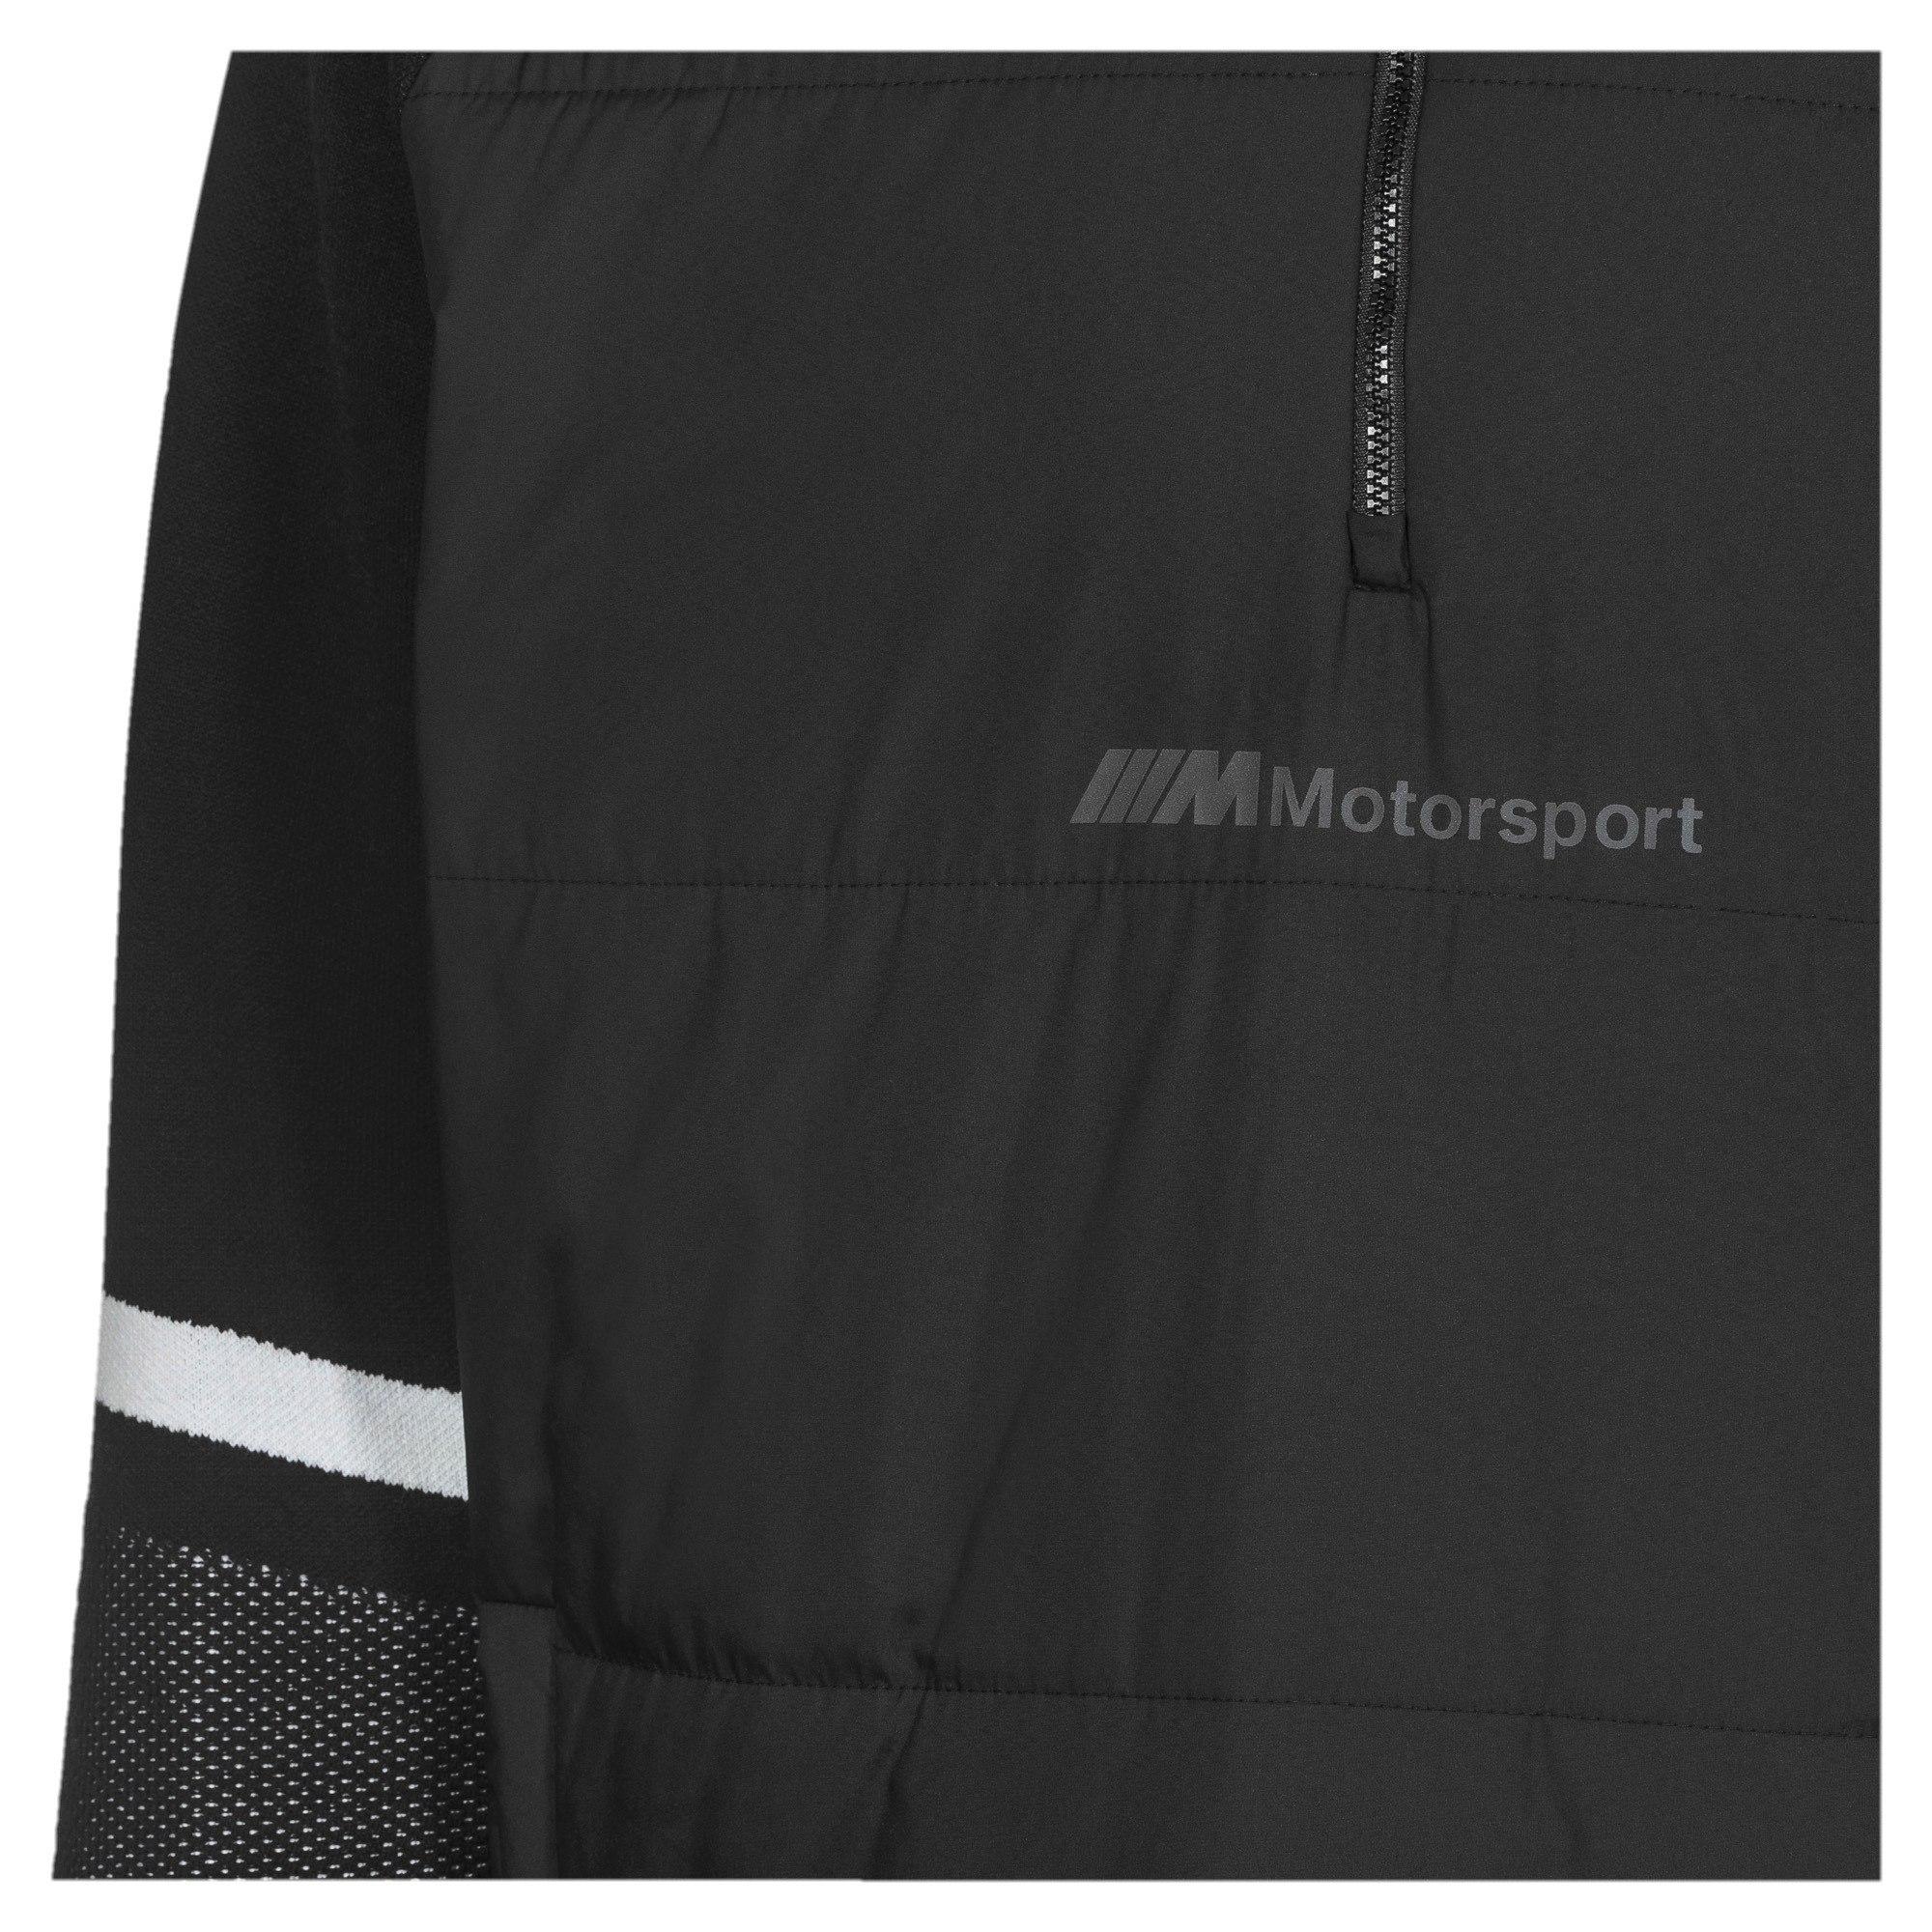 Thumbnail 3 of BMW M Motorsport RCT evoKNIT Men's Midlayer, Puma Black, medium